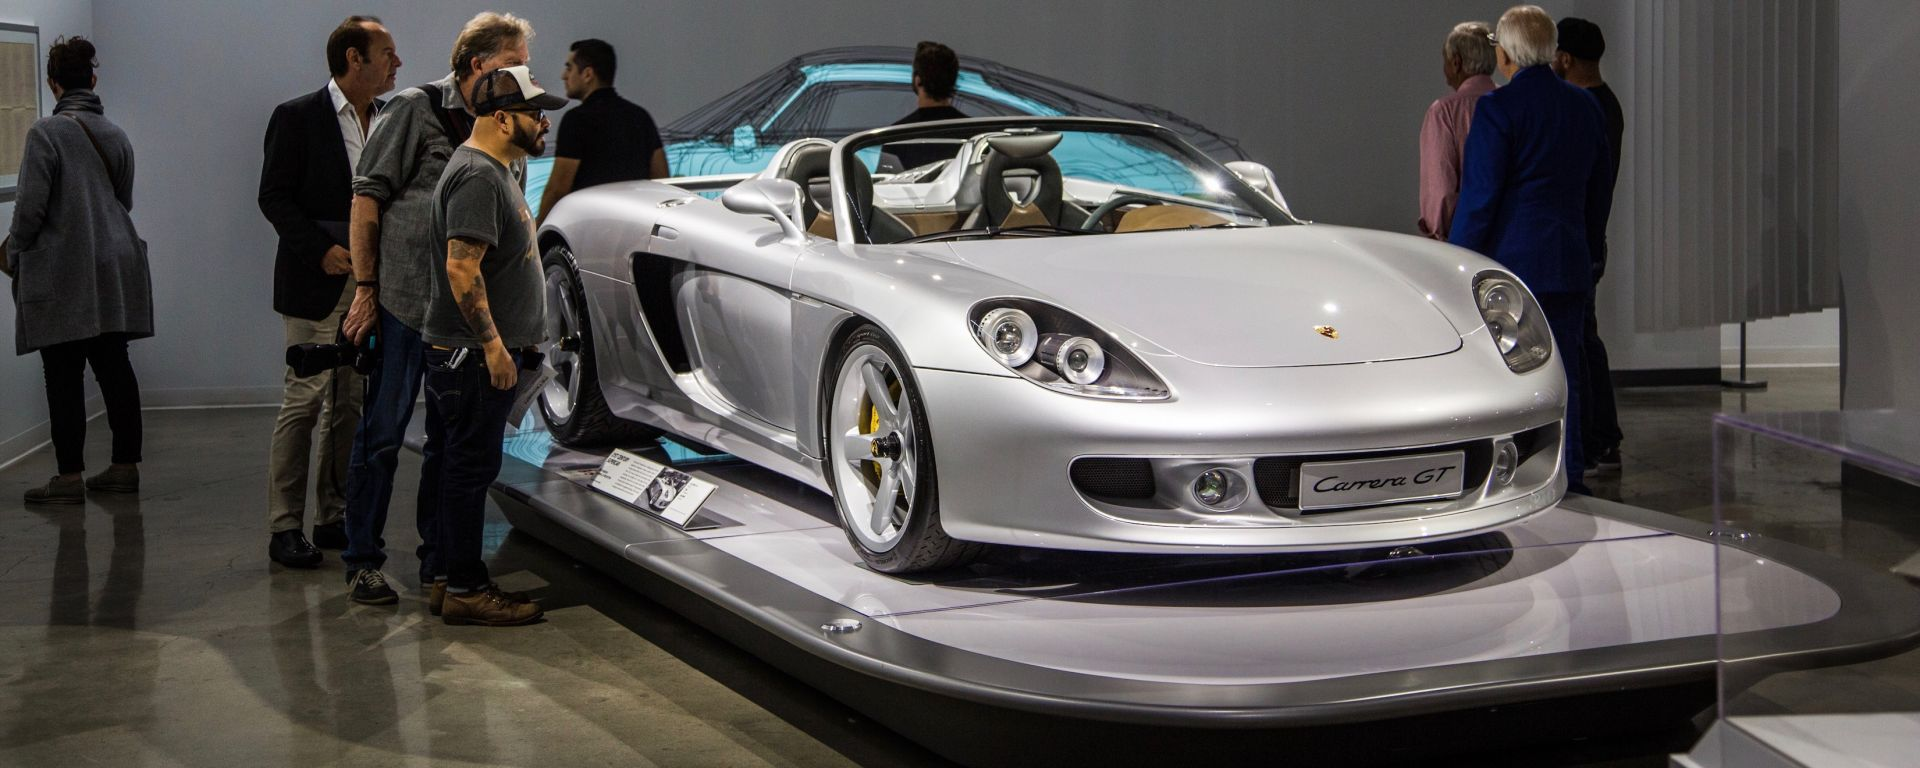 Porsche Carrera GT esposta al Petersen Automotive Museum